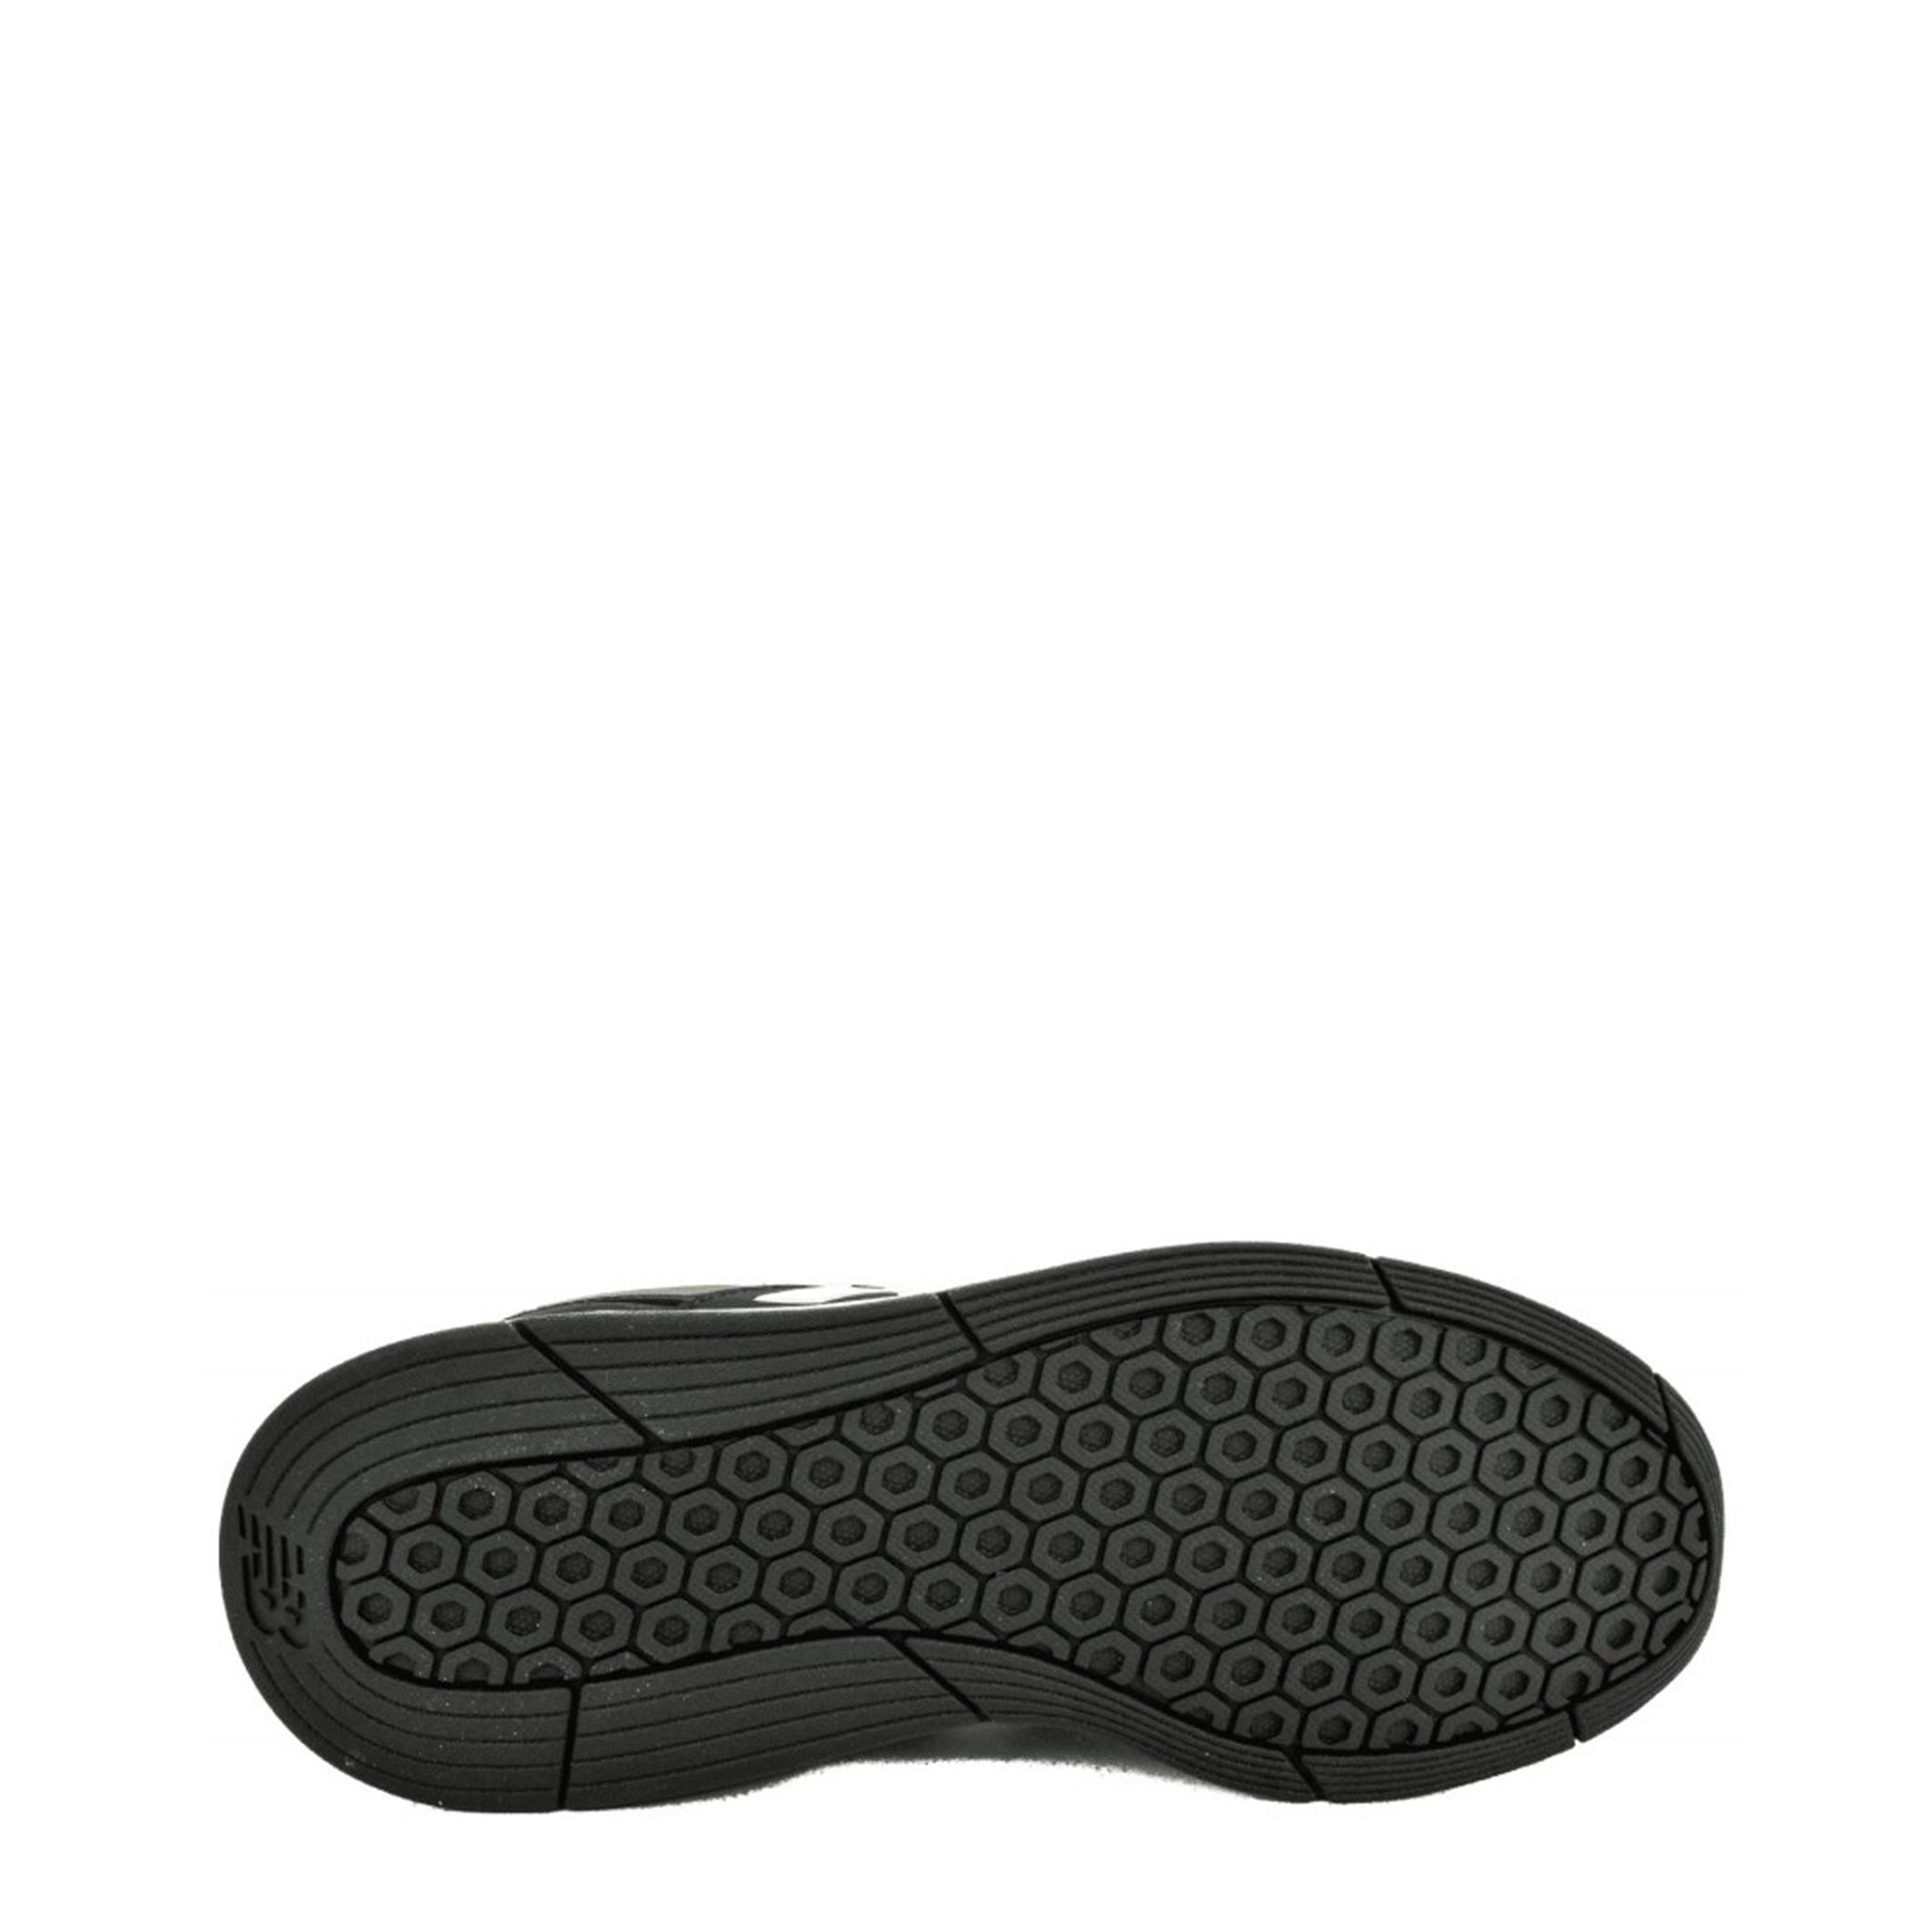 Baskets / Sport  New balance MS247 black